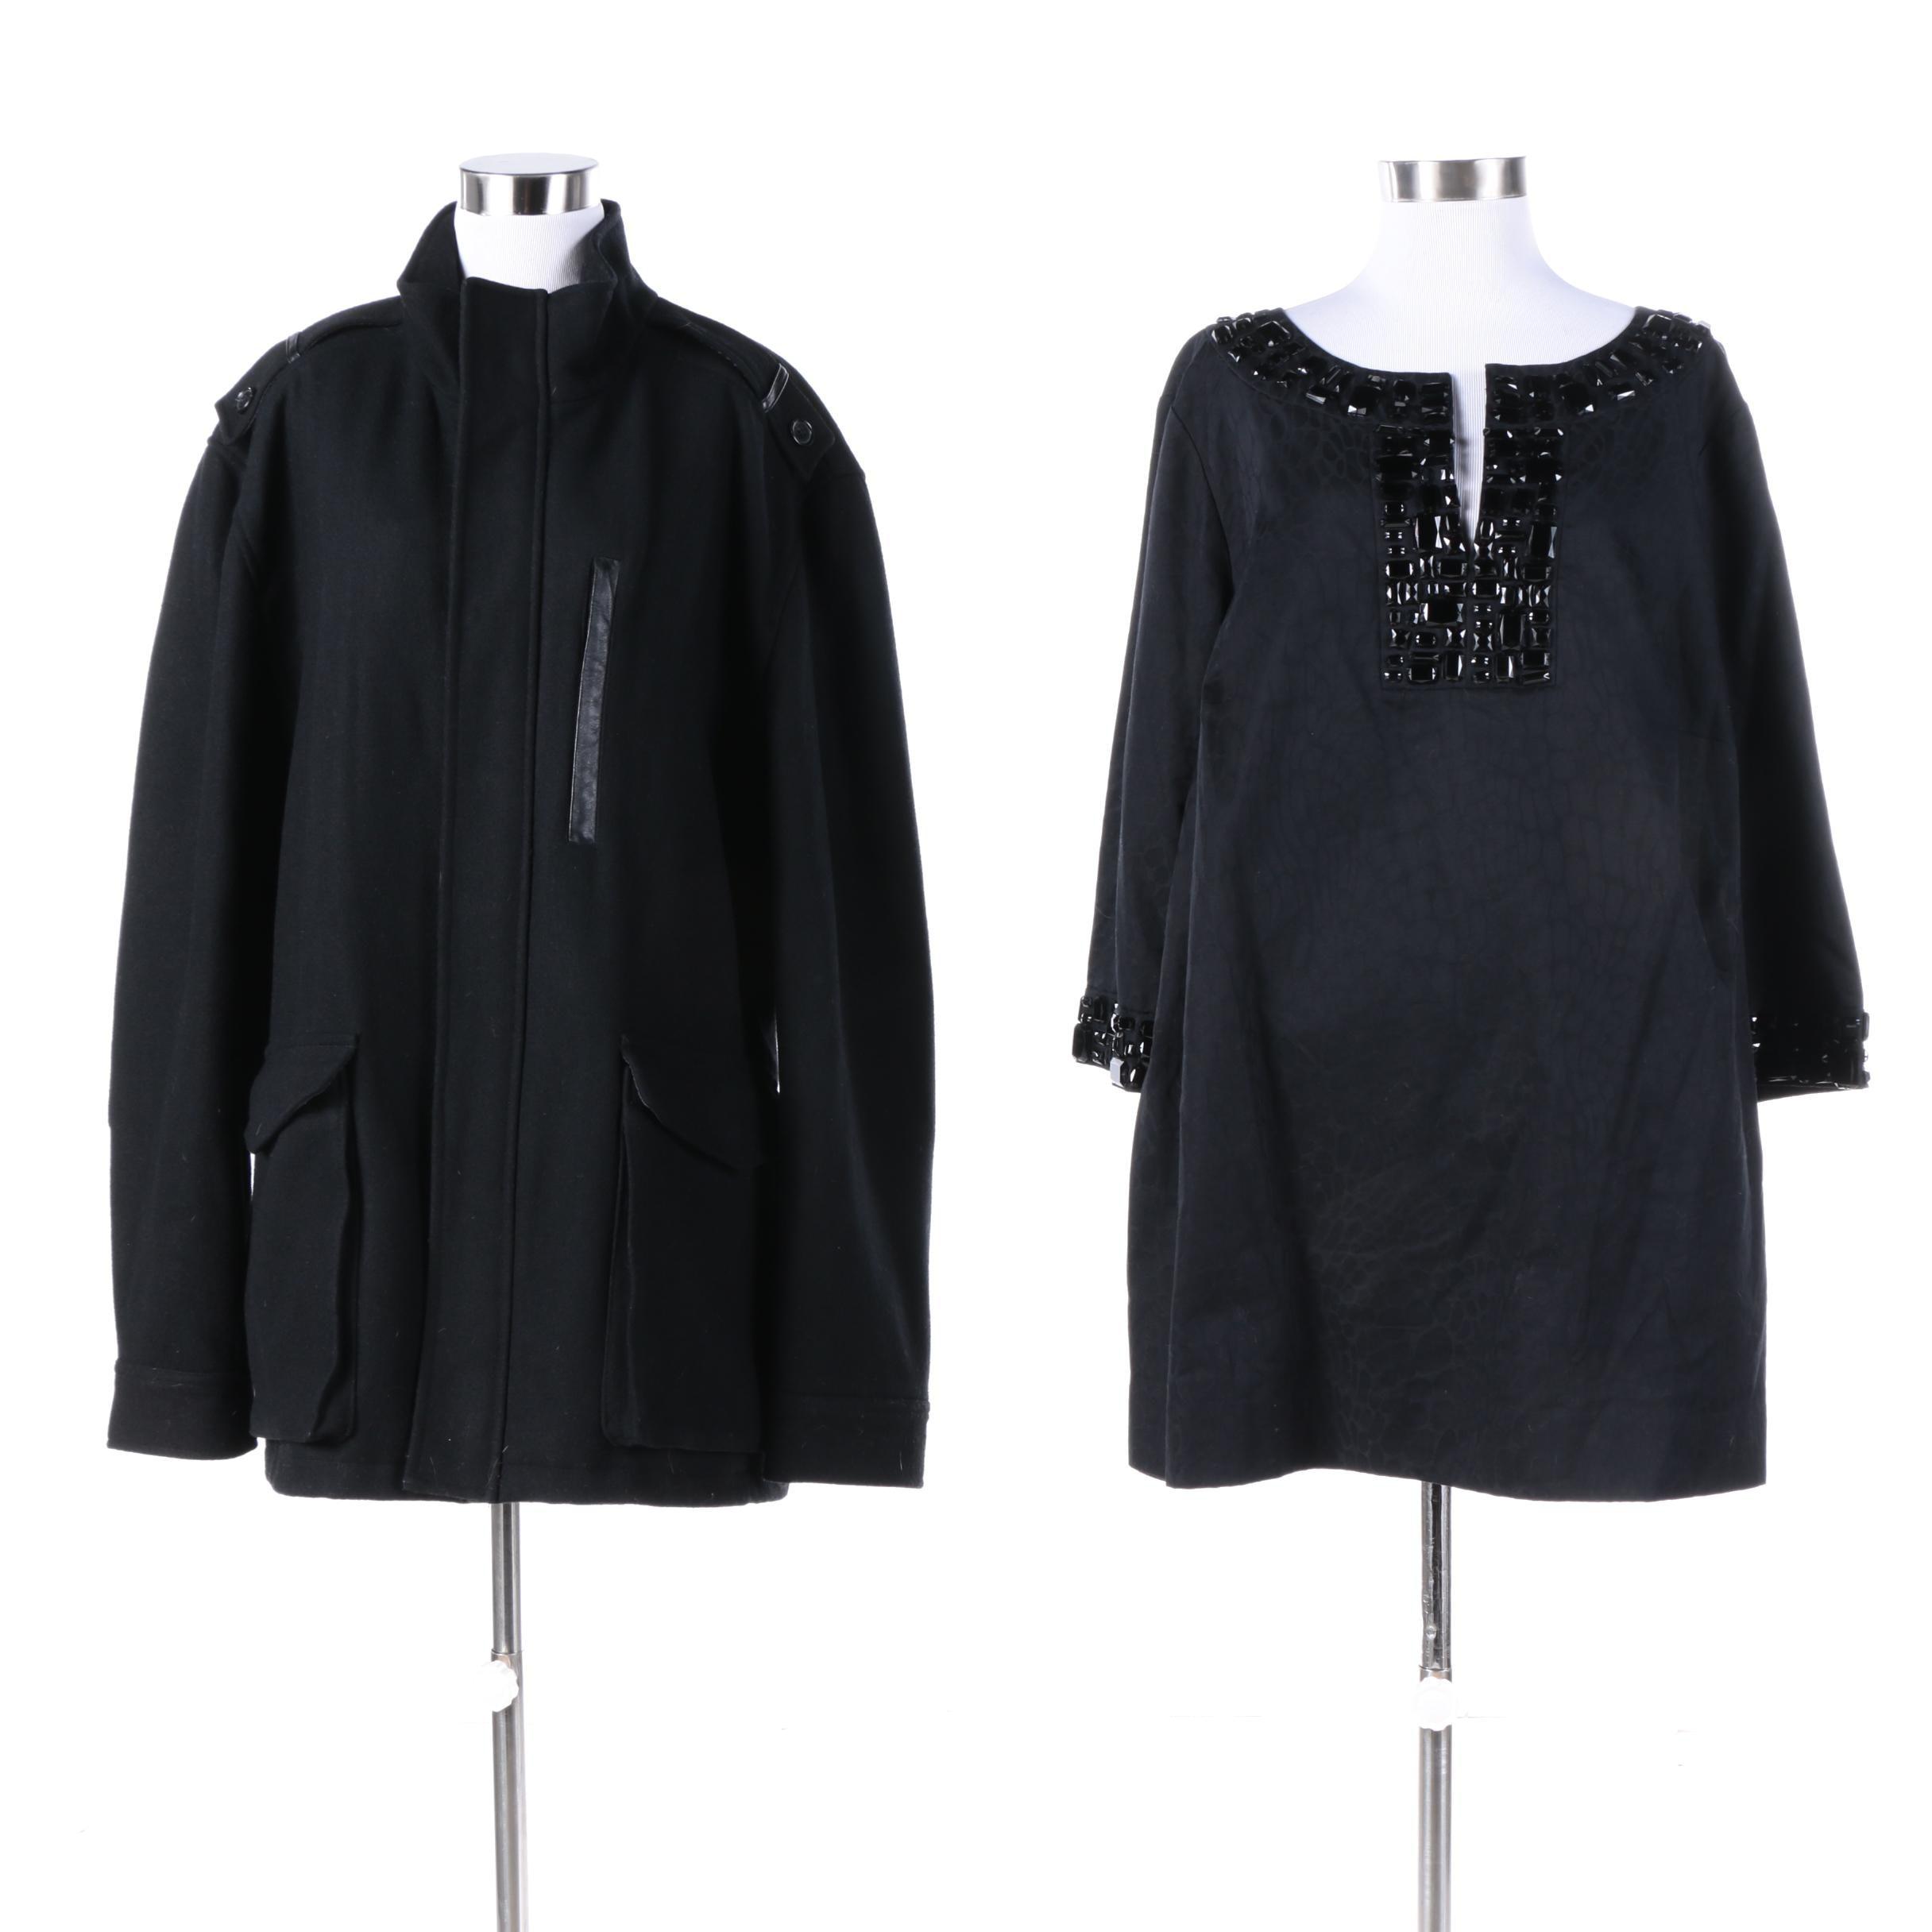 Michael Michael Kors Embellished Top and Cole Haan Black Wool Jacket